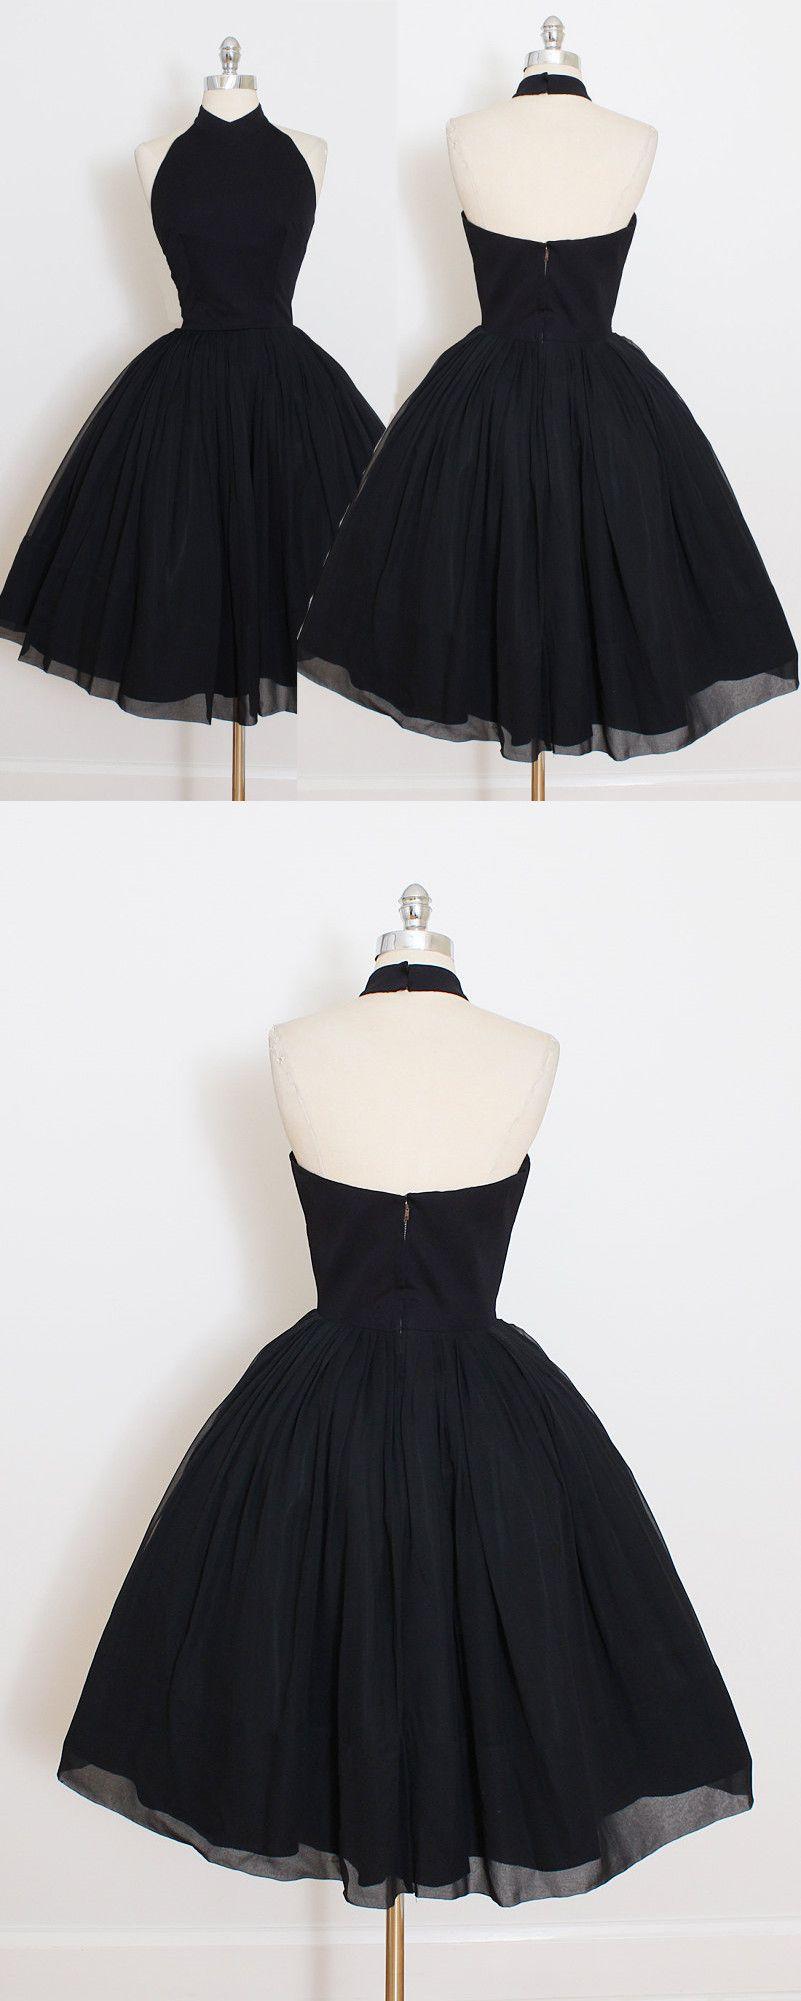 Vintage Short Black Chiffon Knee Length Short Prom Dress Party Dress